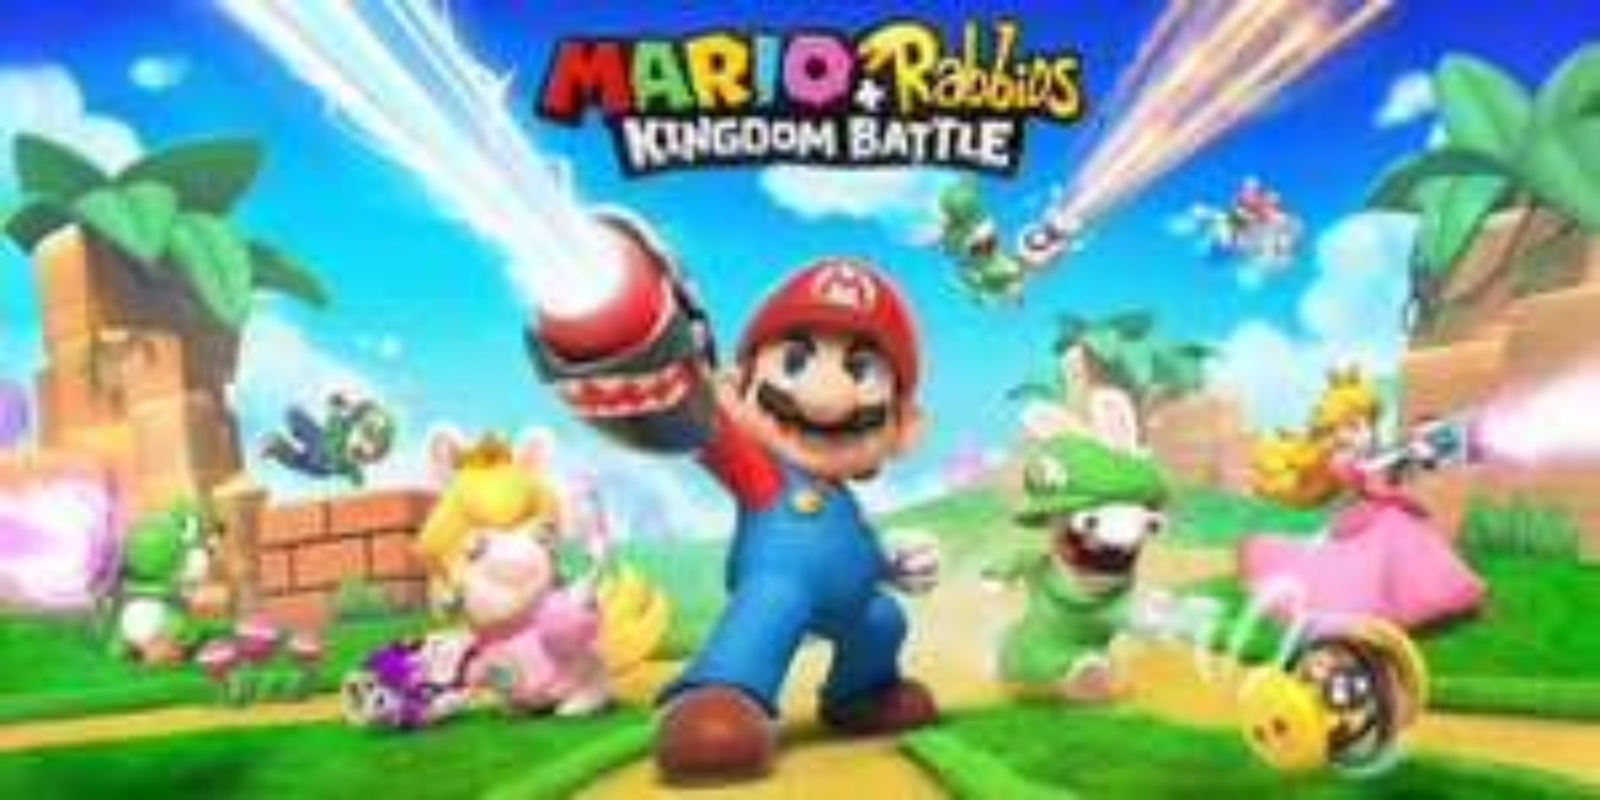 Mario + Rabbids Kingdom Battle (Nintendo Switch) £11.09 @ Nintendo E-Shop